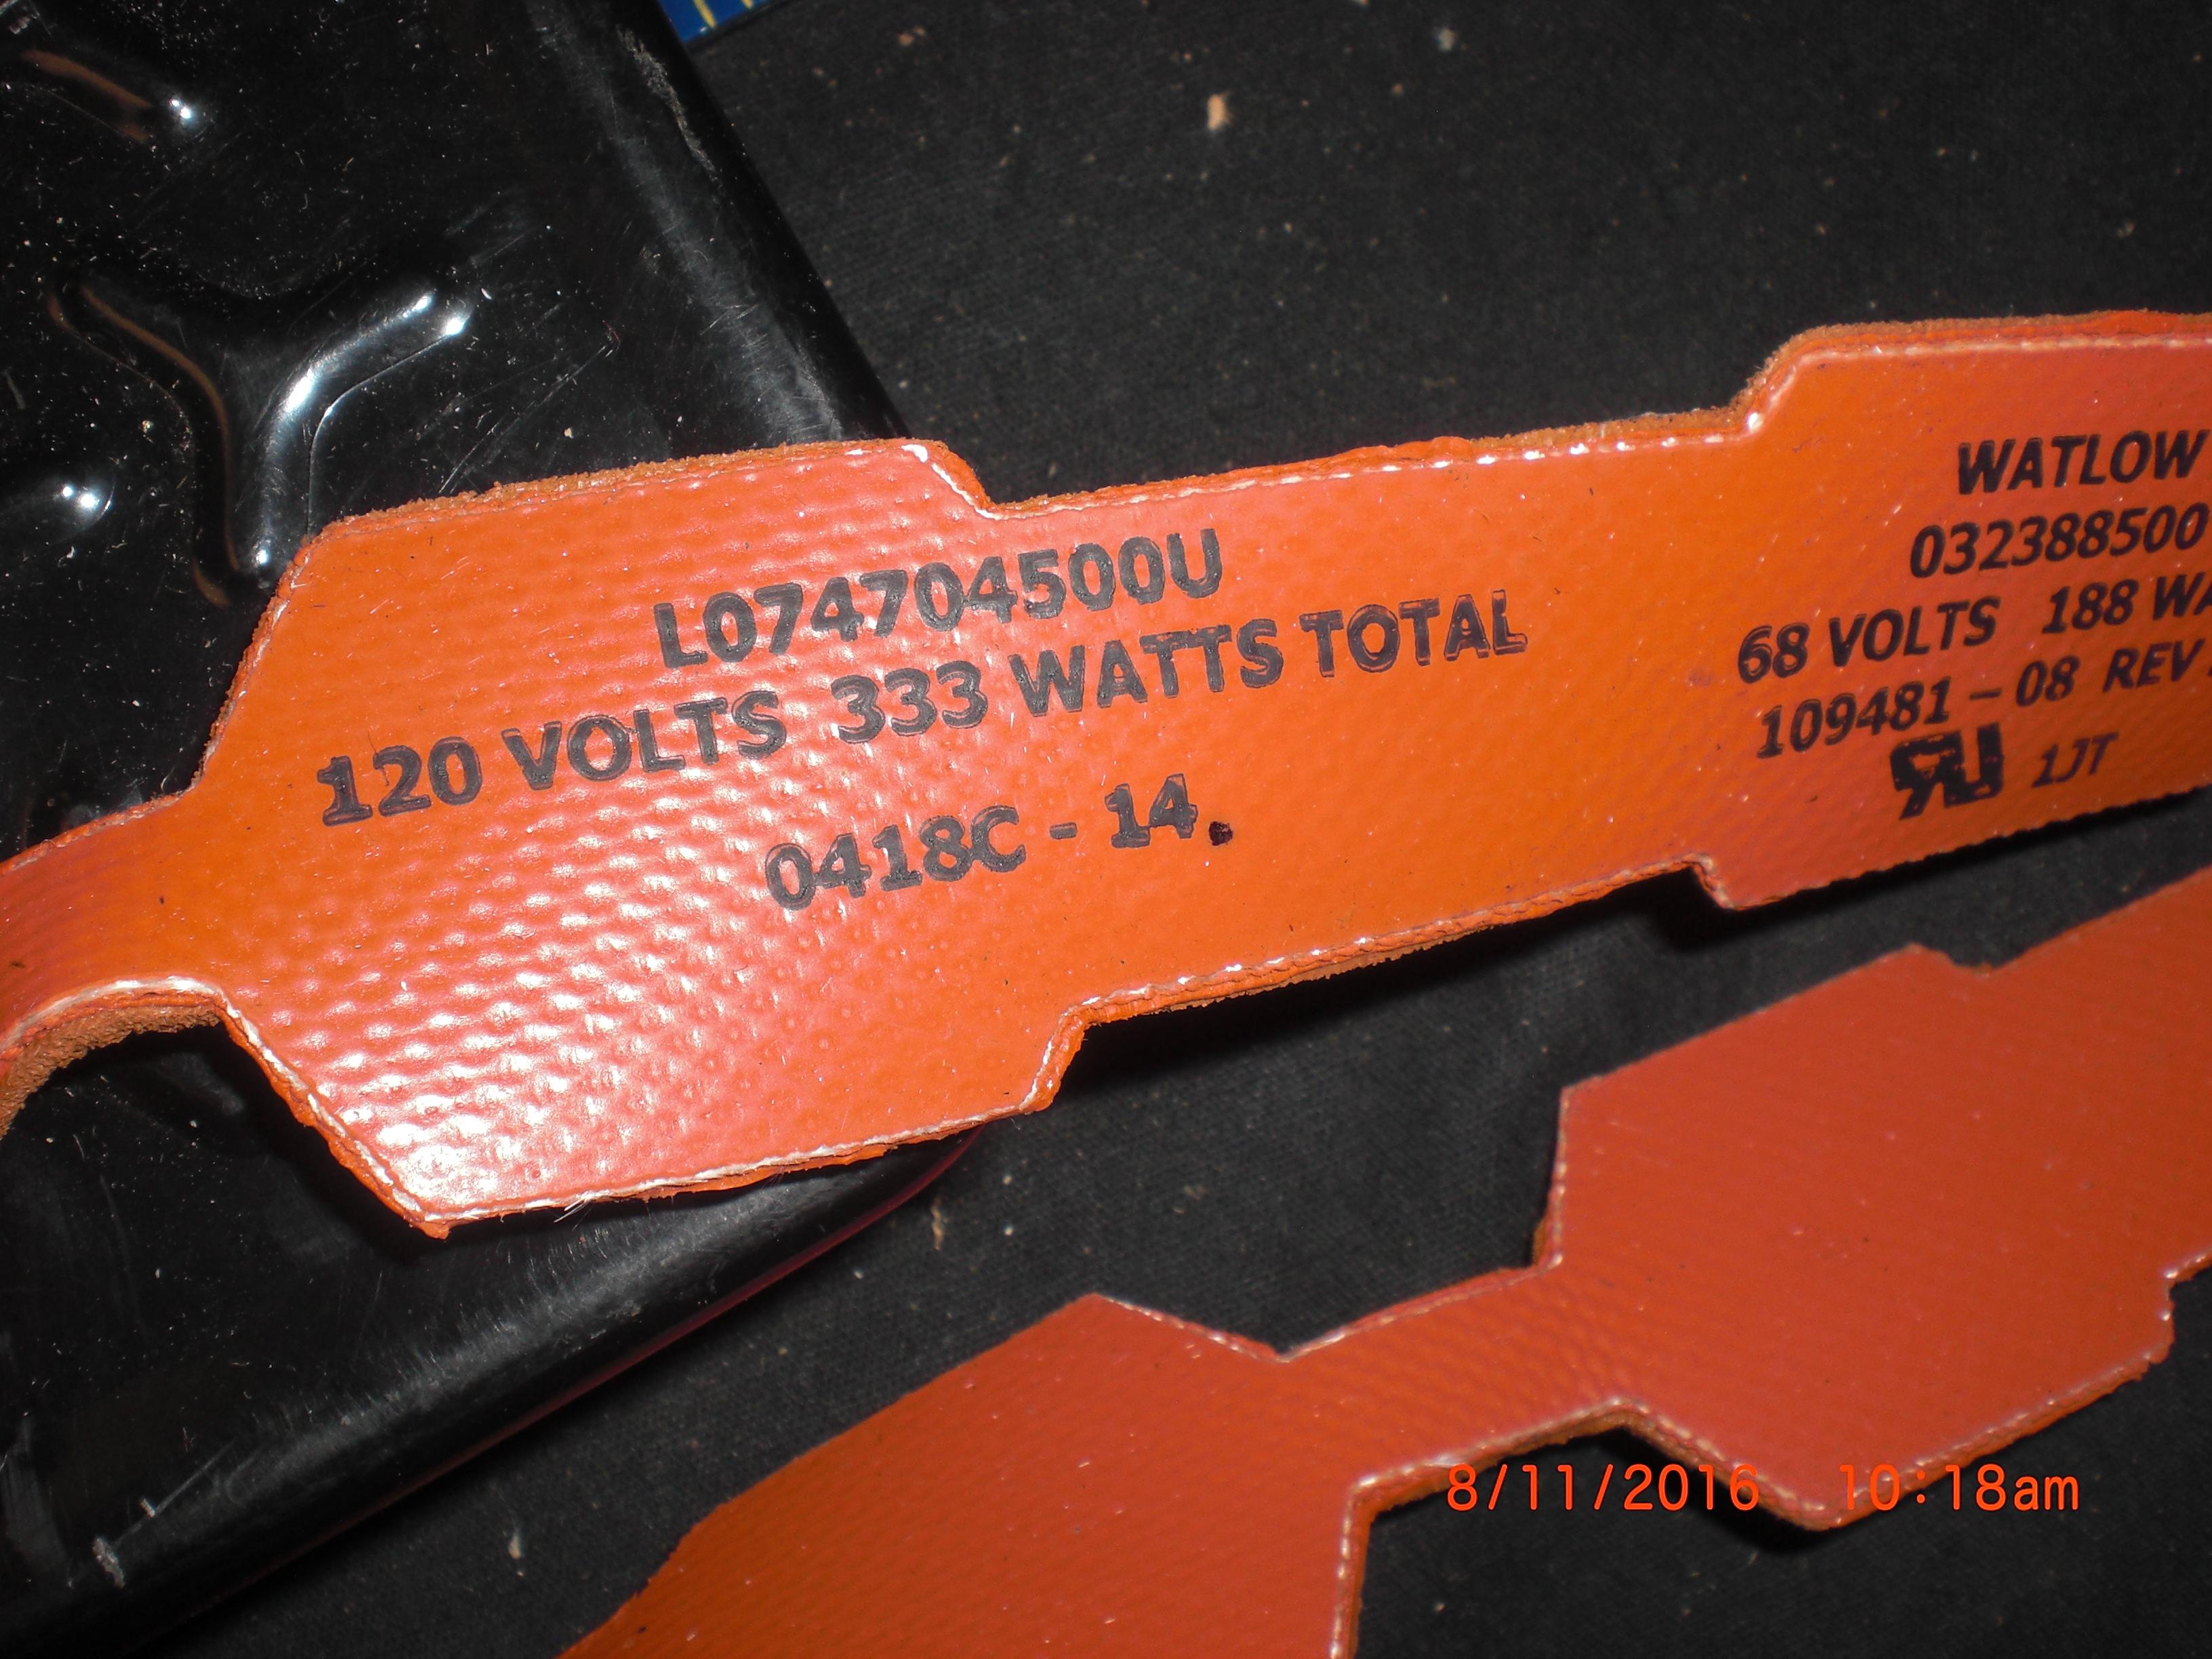 Heater 120V 333W silicon Pail / Drum  WATLOW L074704500U